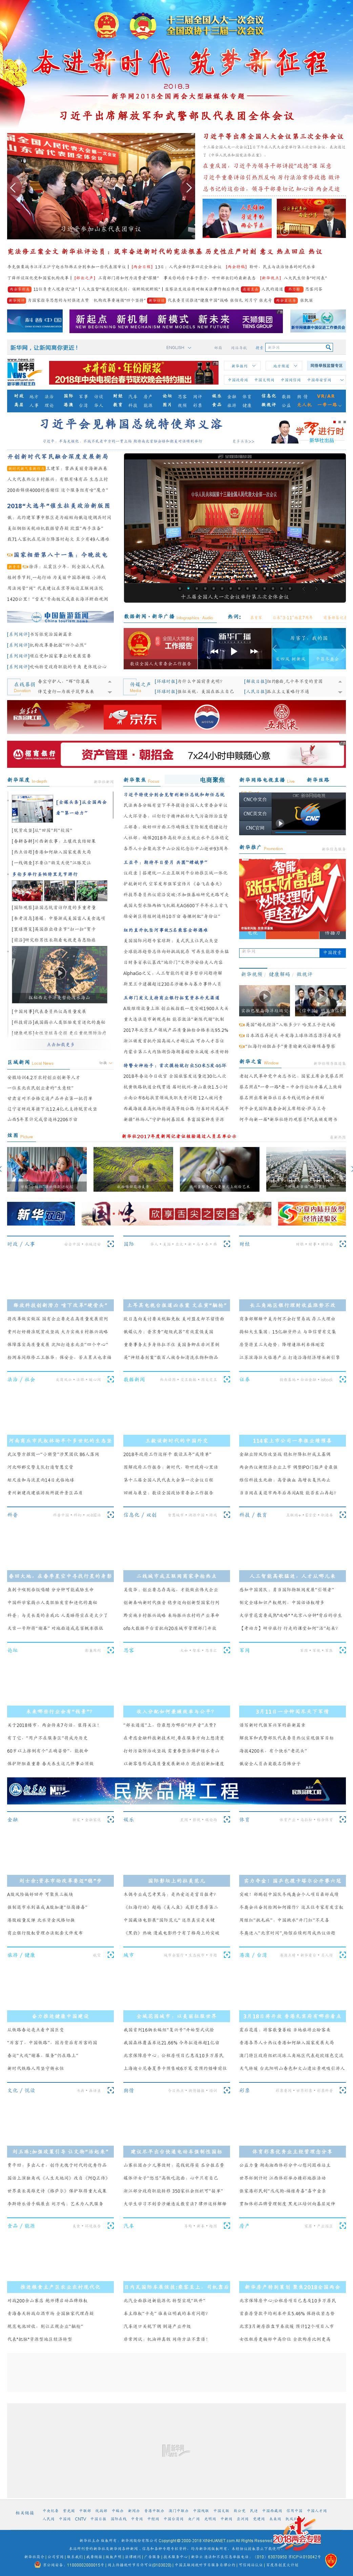 Xinhua at Monday March 12, 2018, 2:26 p.m. UTC